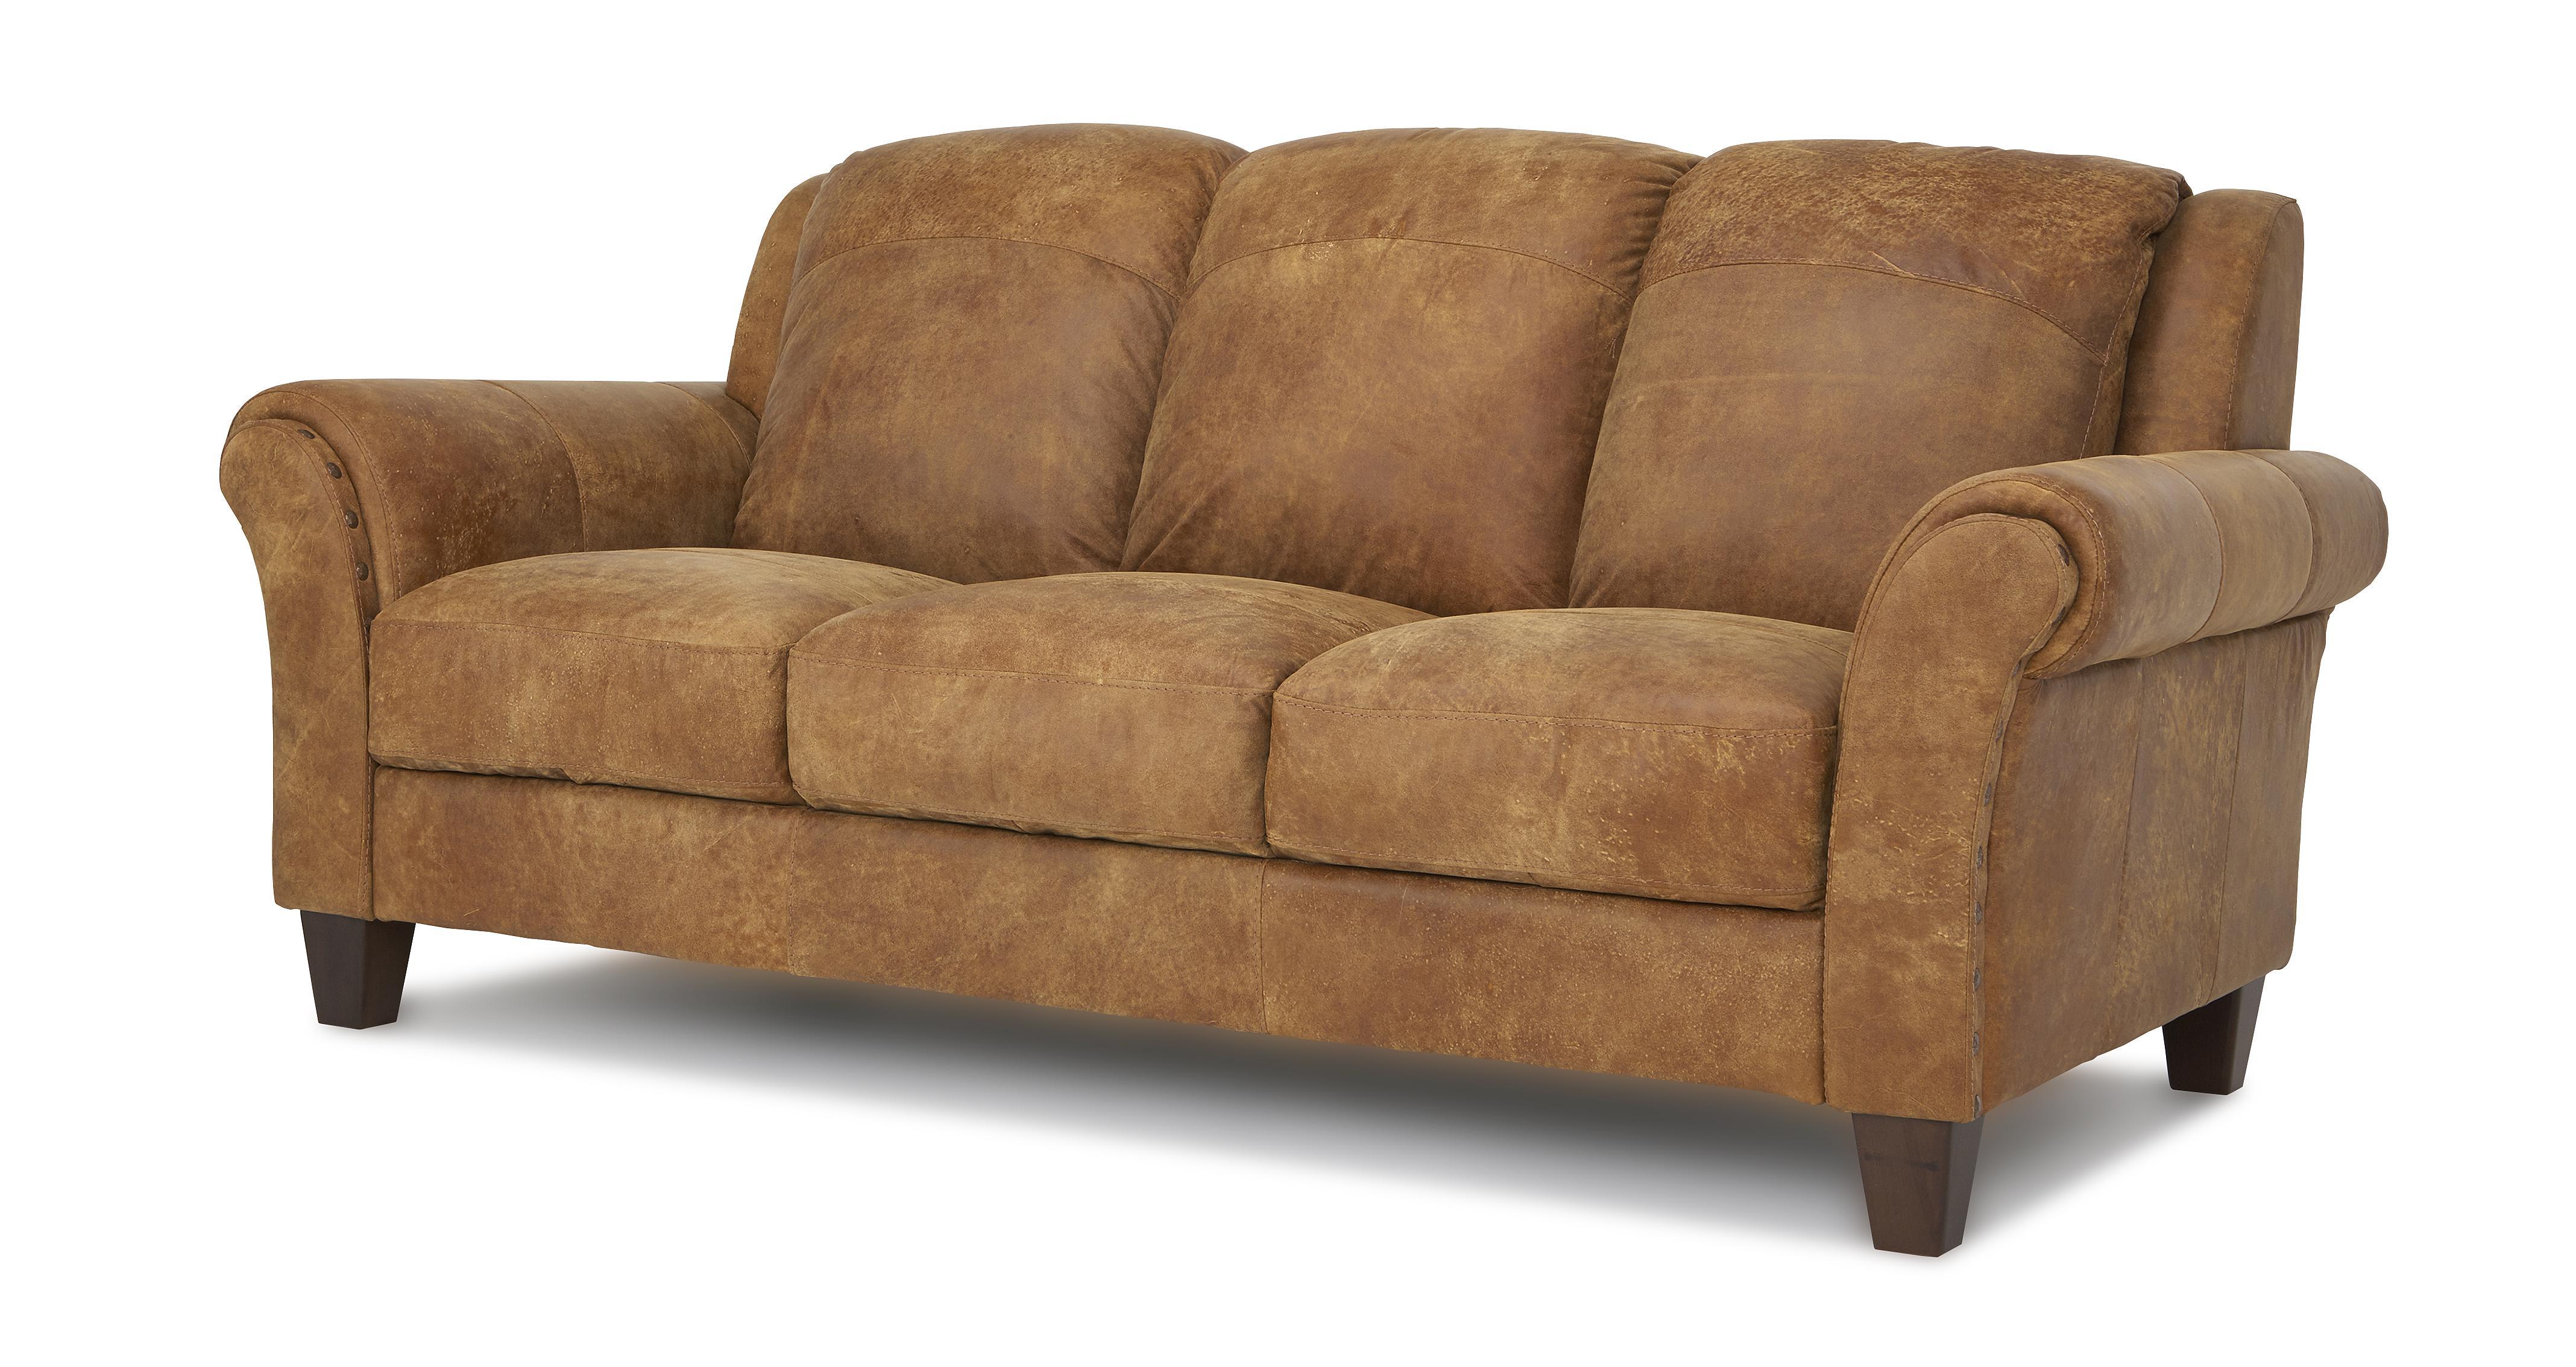 Superior Dfs Peyton Ranch Leather Sofa Set Inc 3 Seater 2 Storage